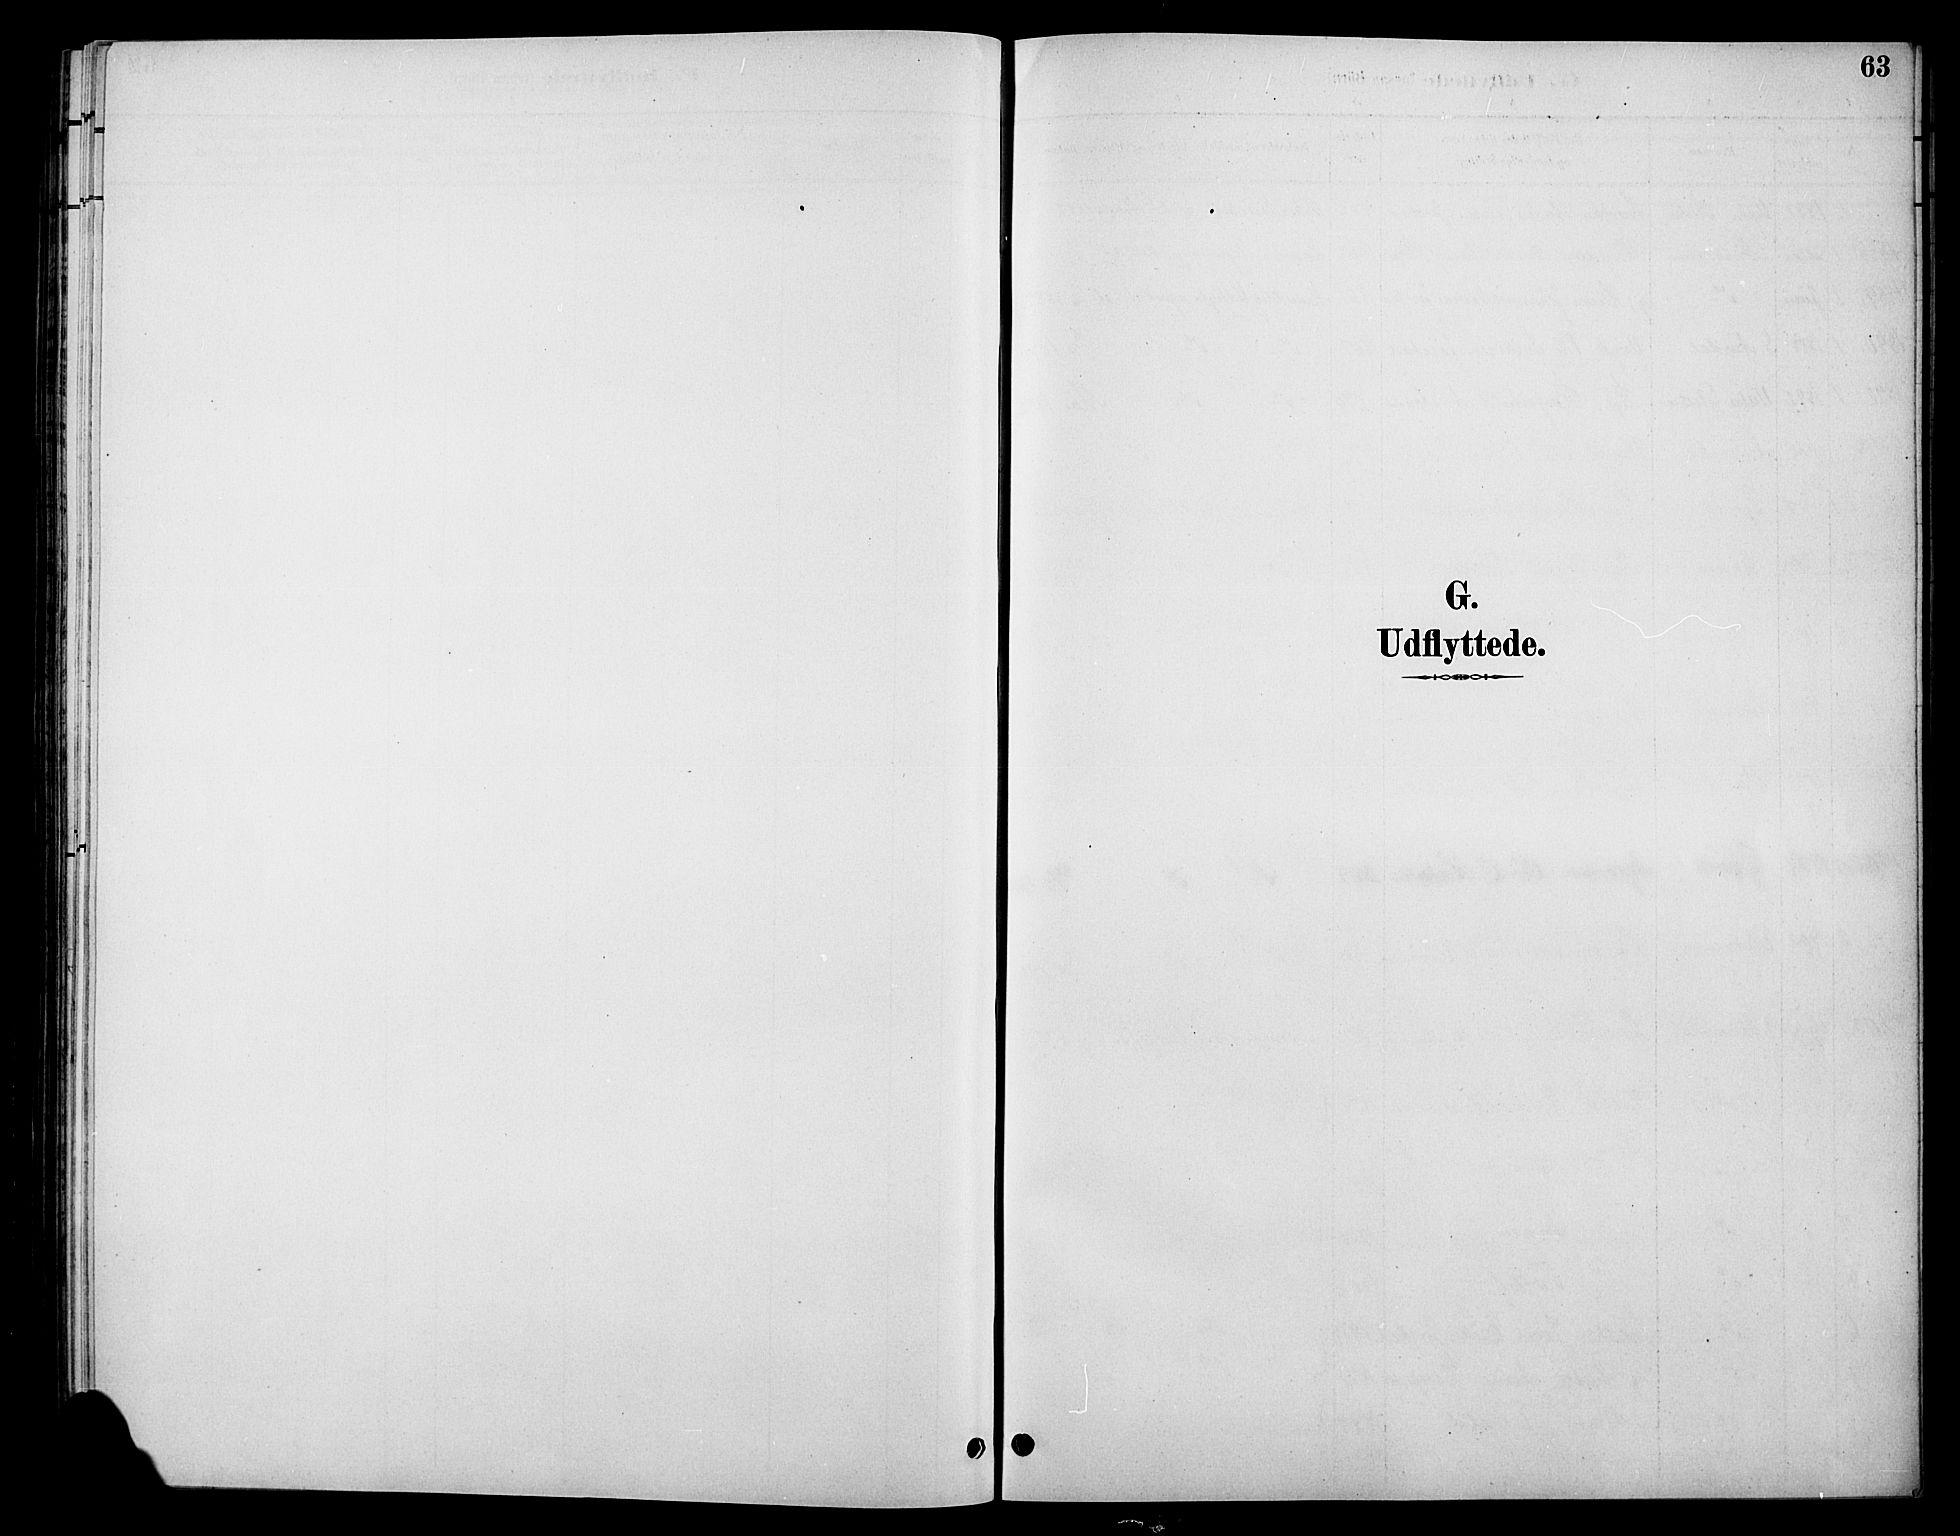 SAH, Øystre Slidre prestekontor, Klokkerbok nr. 6, 1887-1916, s. 63